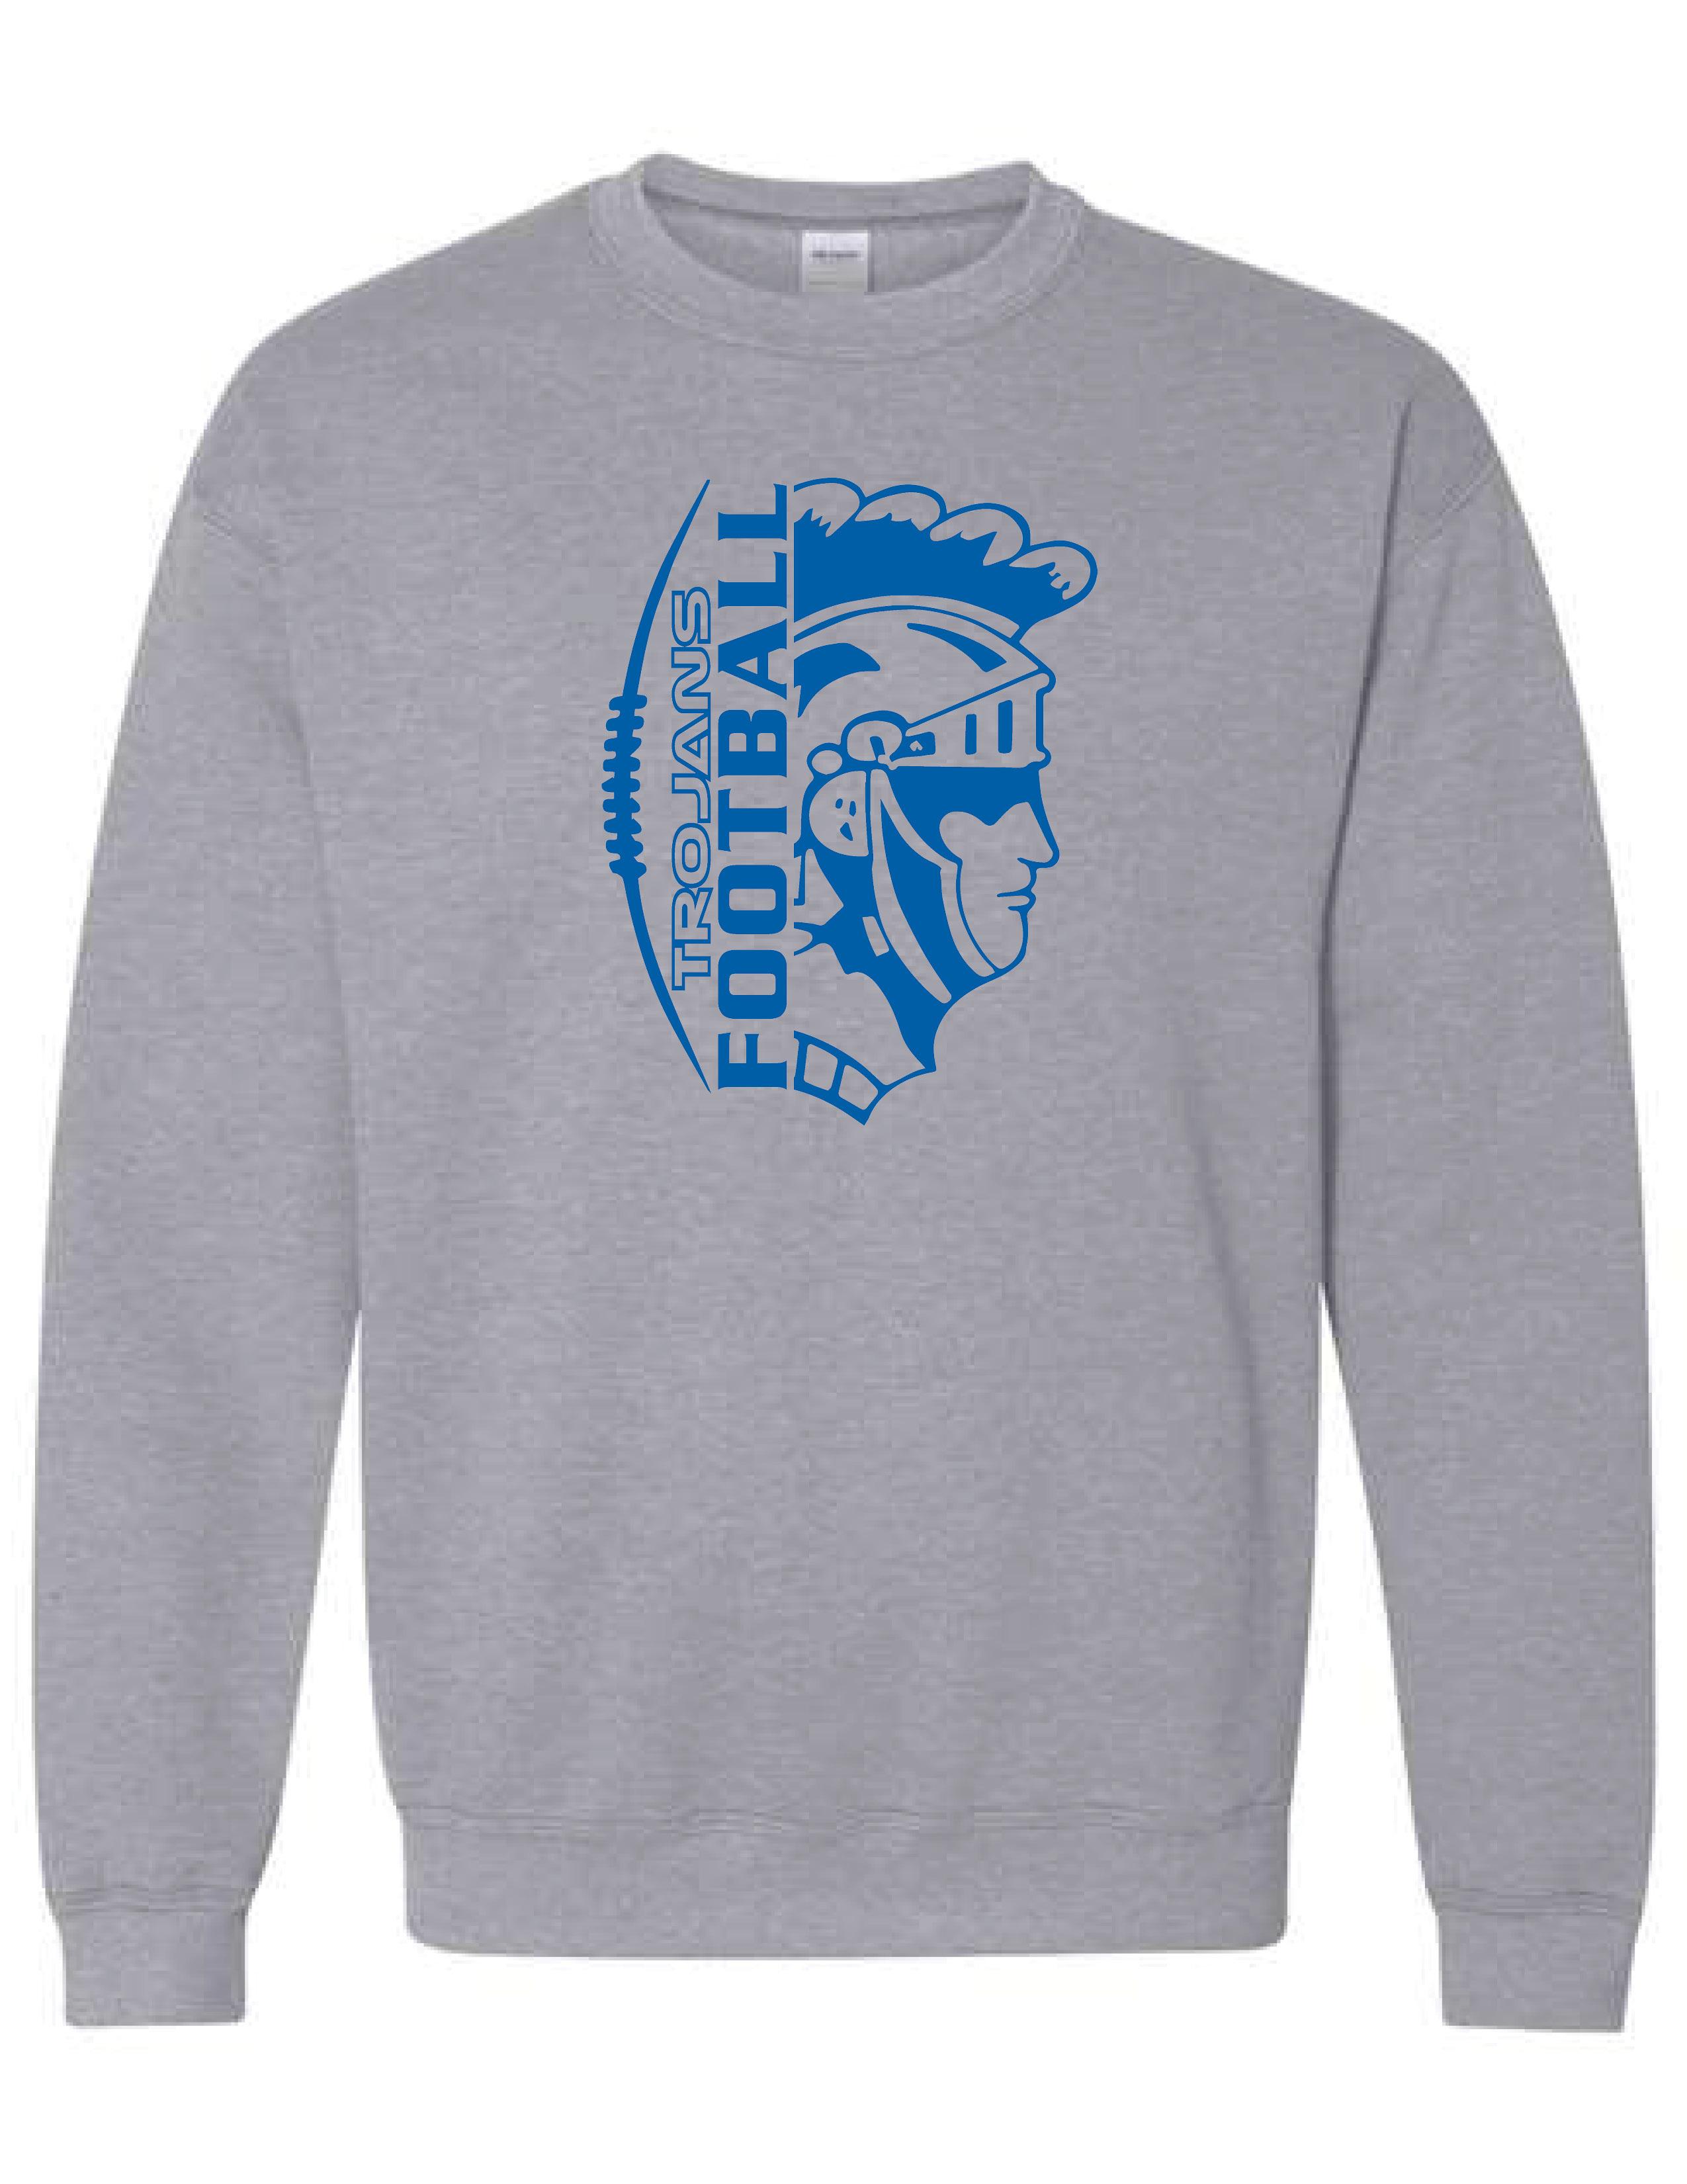 Crew Neck Sweatshirt  (TROJAN) (Youth sizes Available)